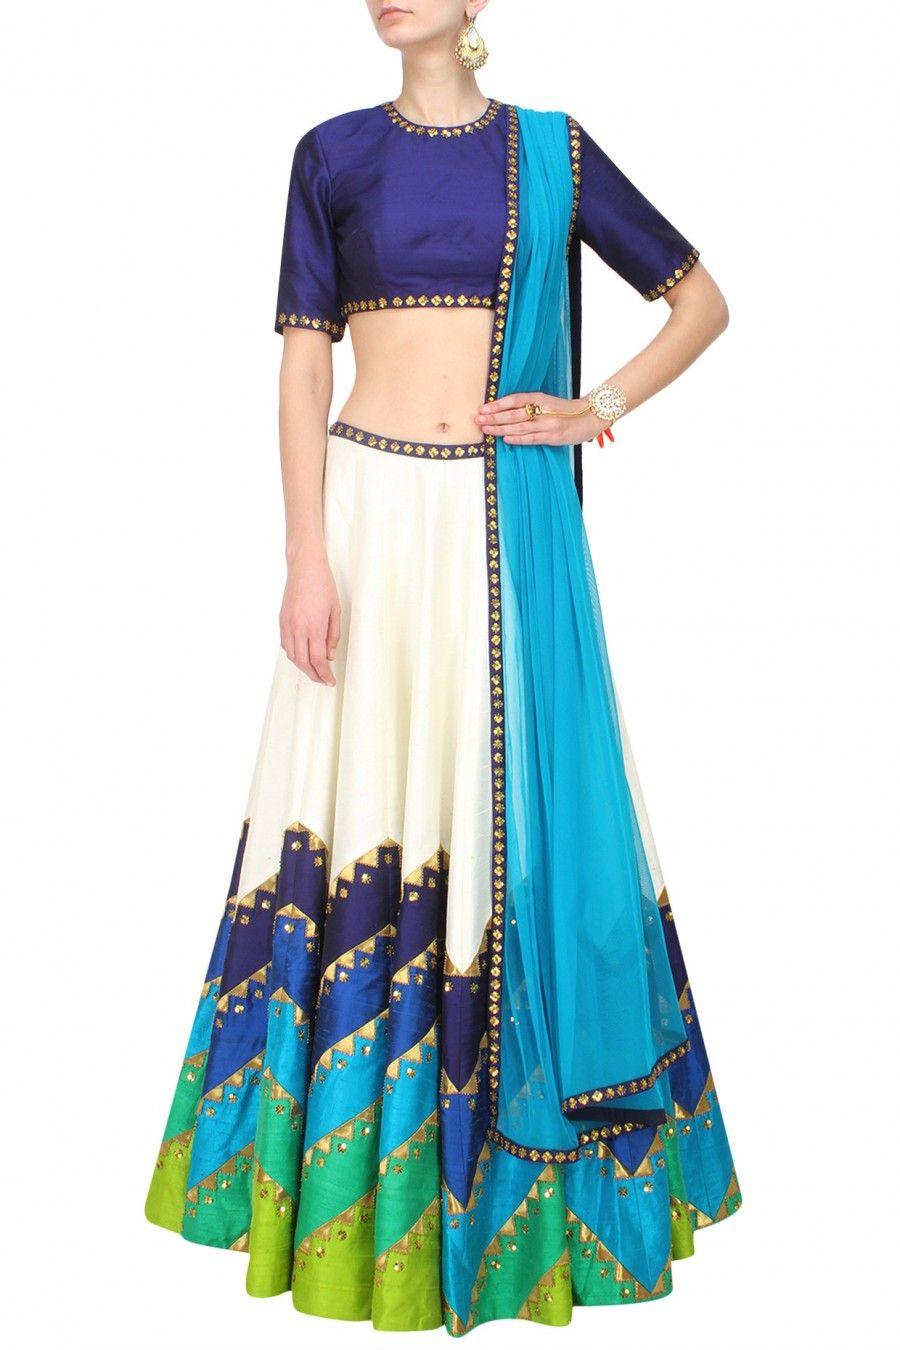 Priyal prakash fashion pinterest receptions shades of